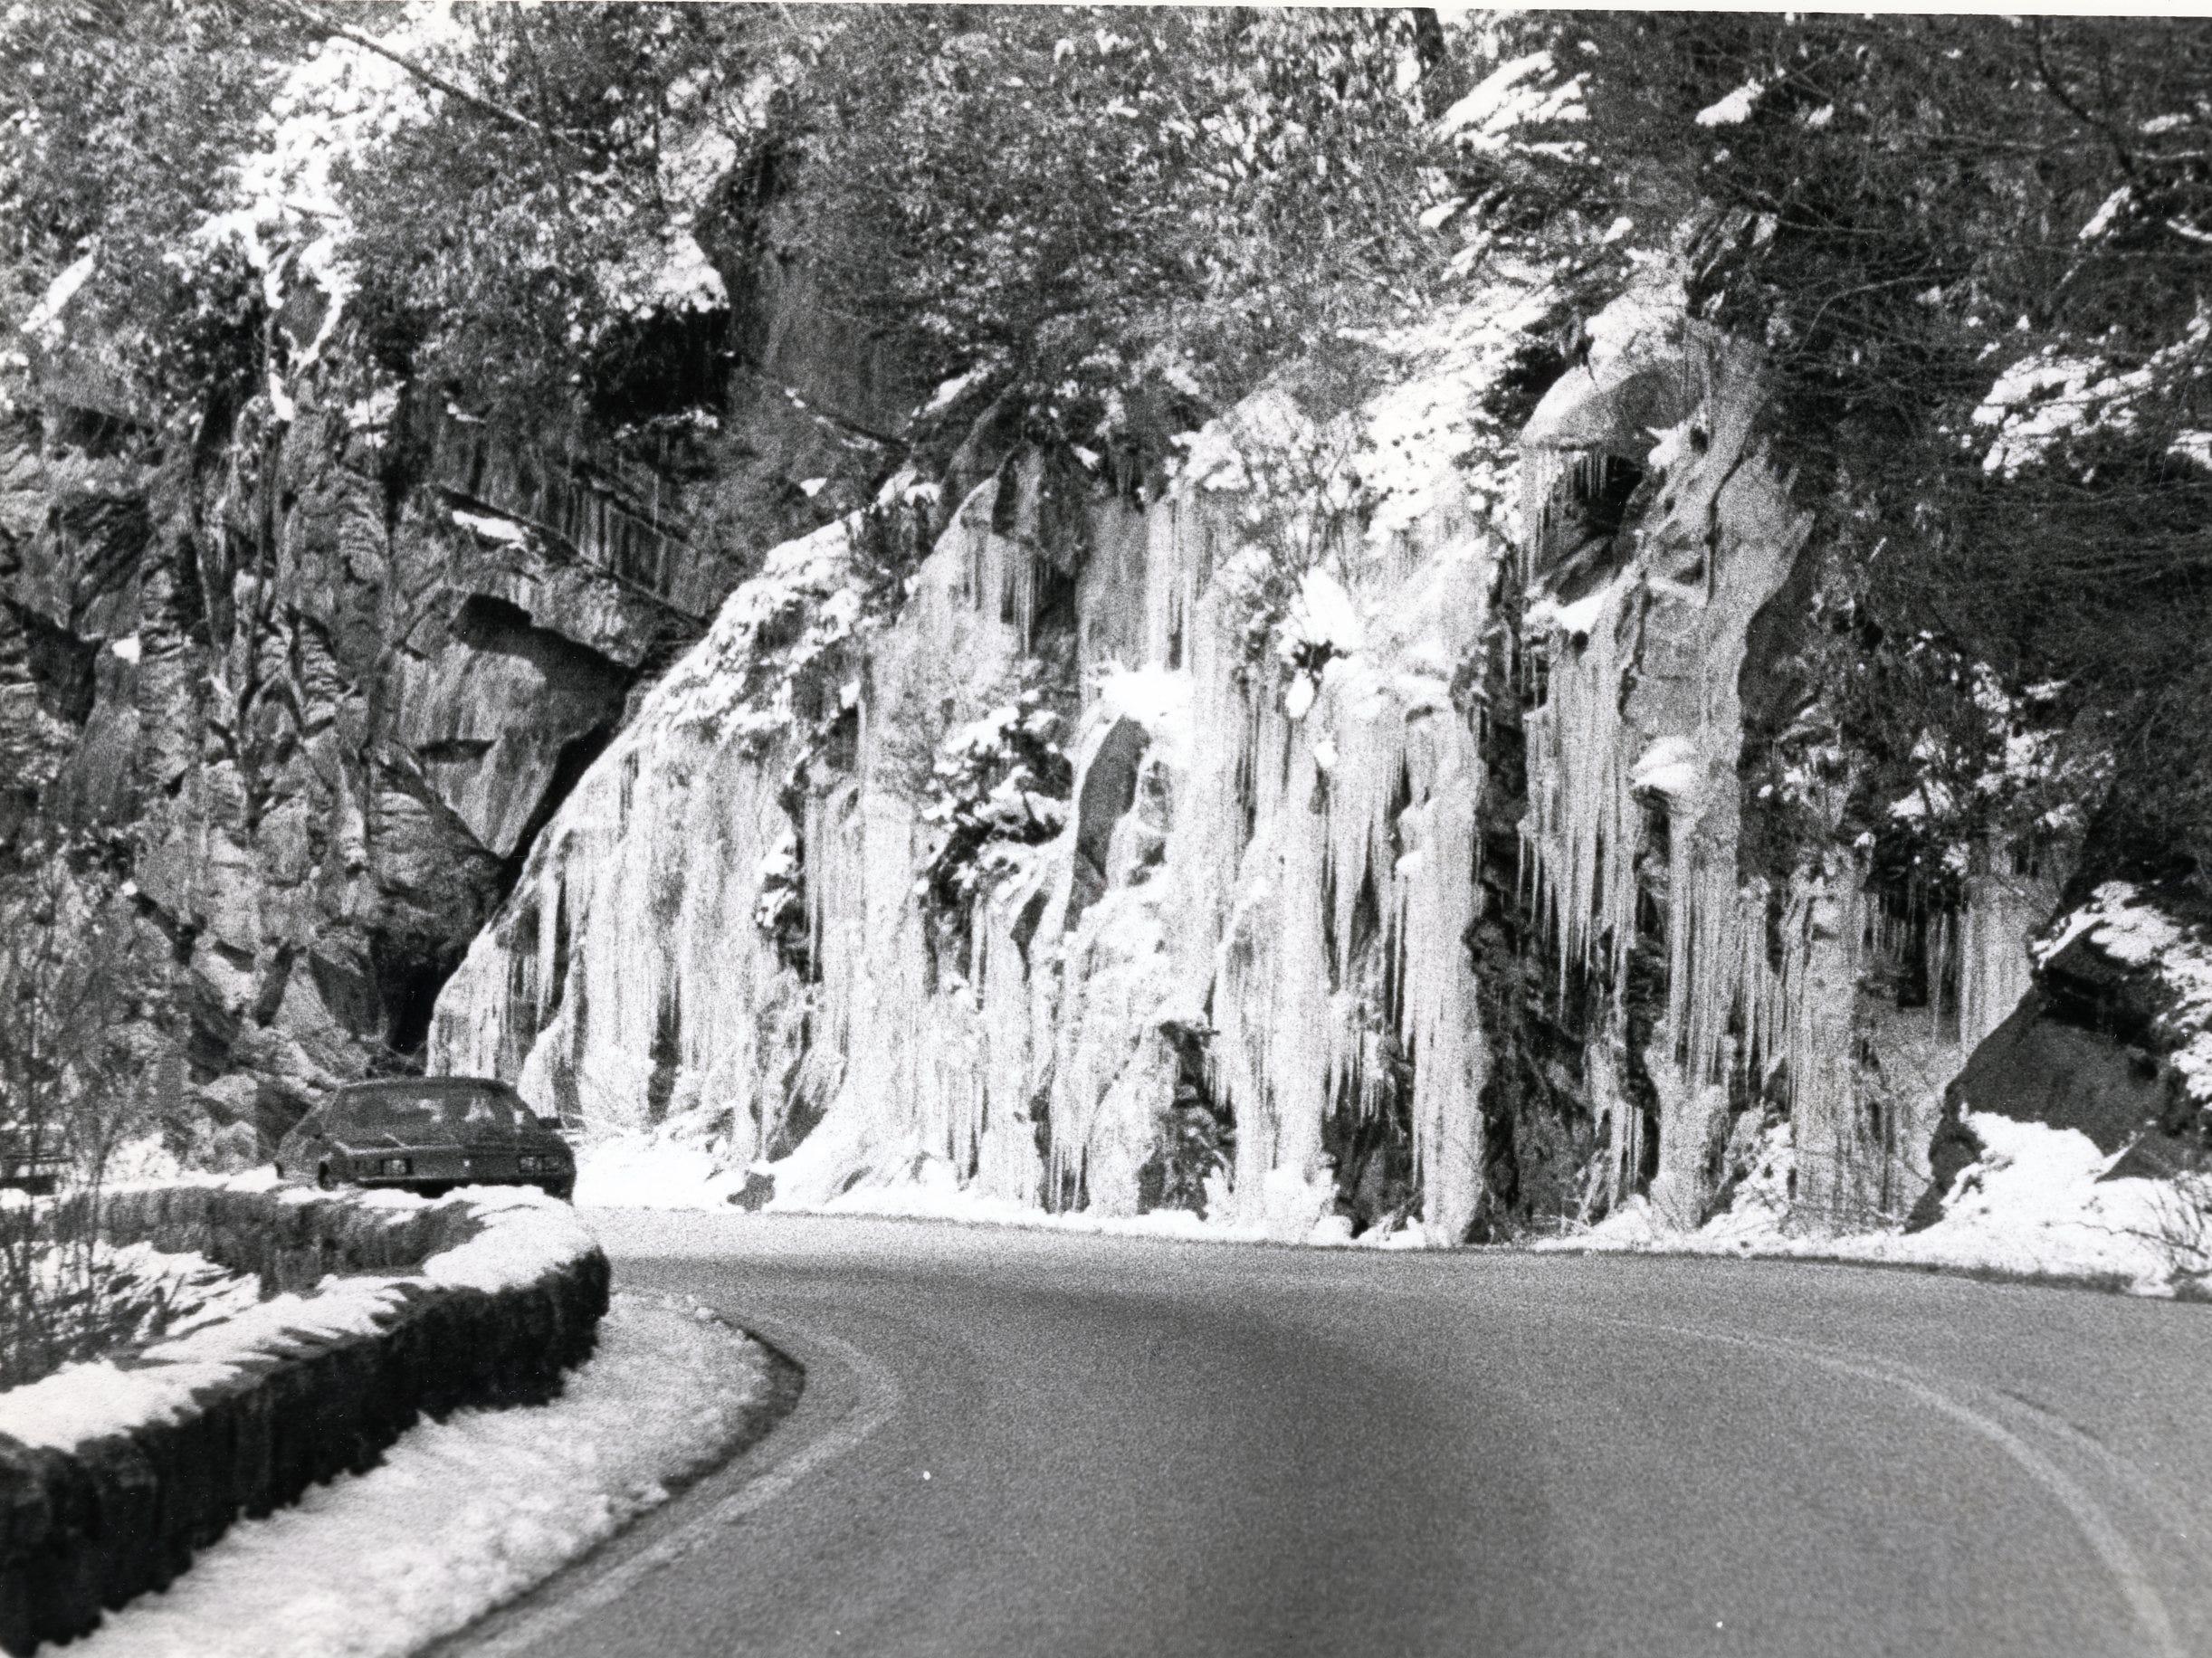 Highway 441 near Newfound Gap, April, 1983.